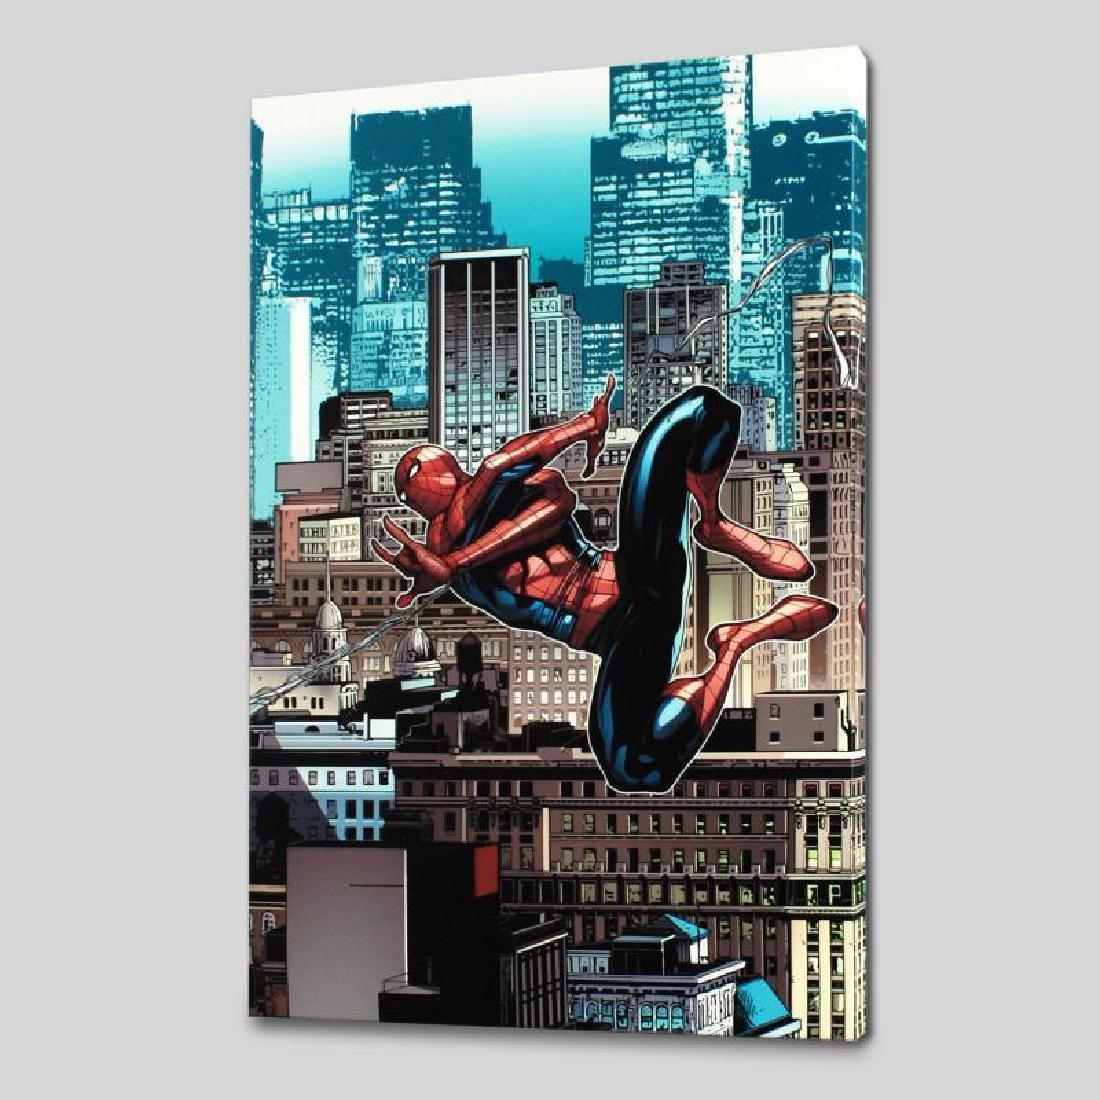 Amazing Spider-Man #666 by Marvel Comics - 3